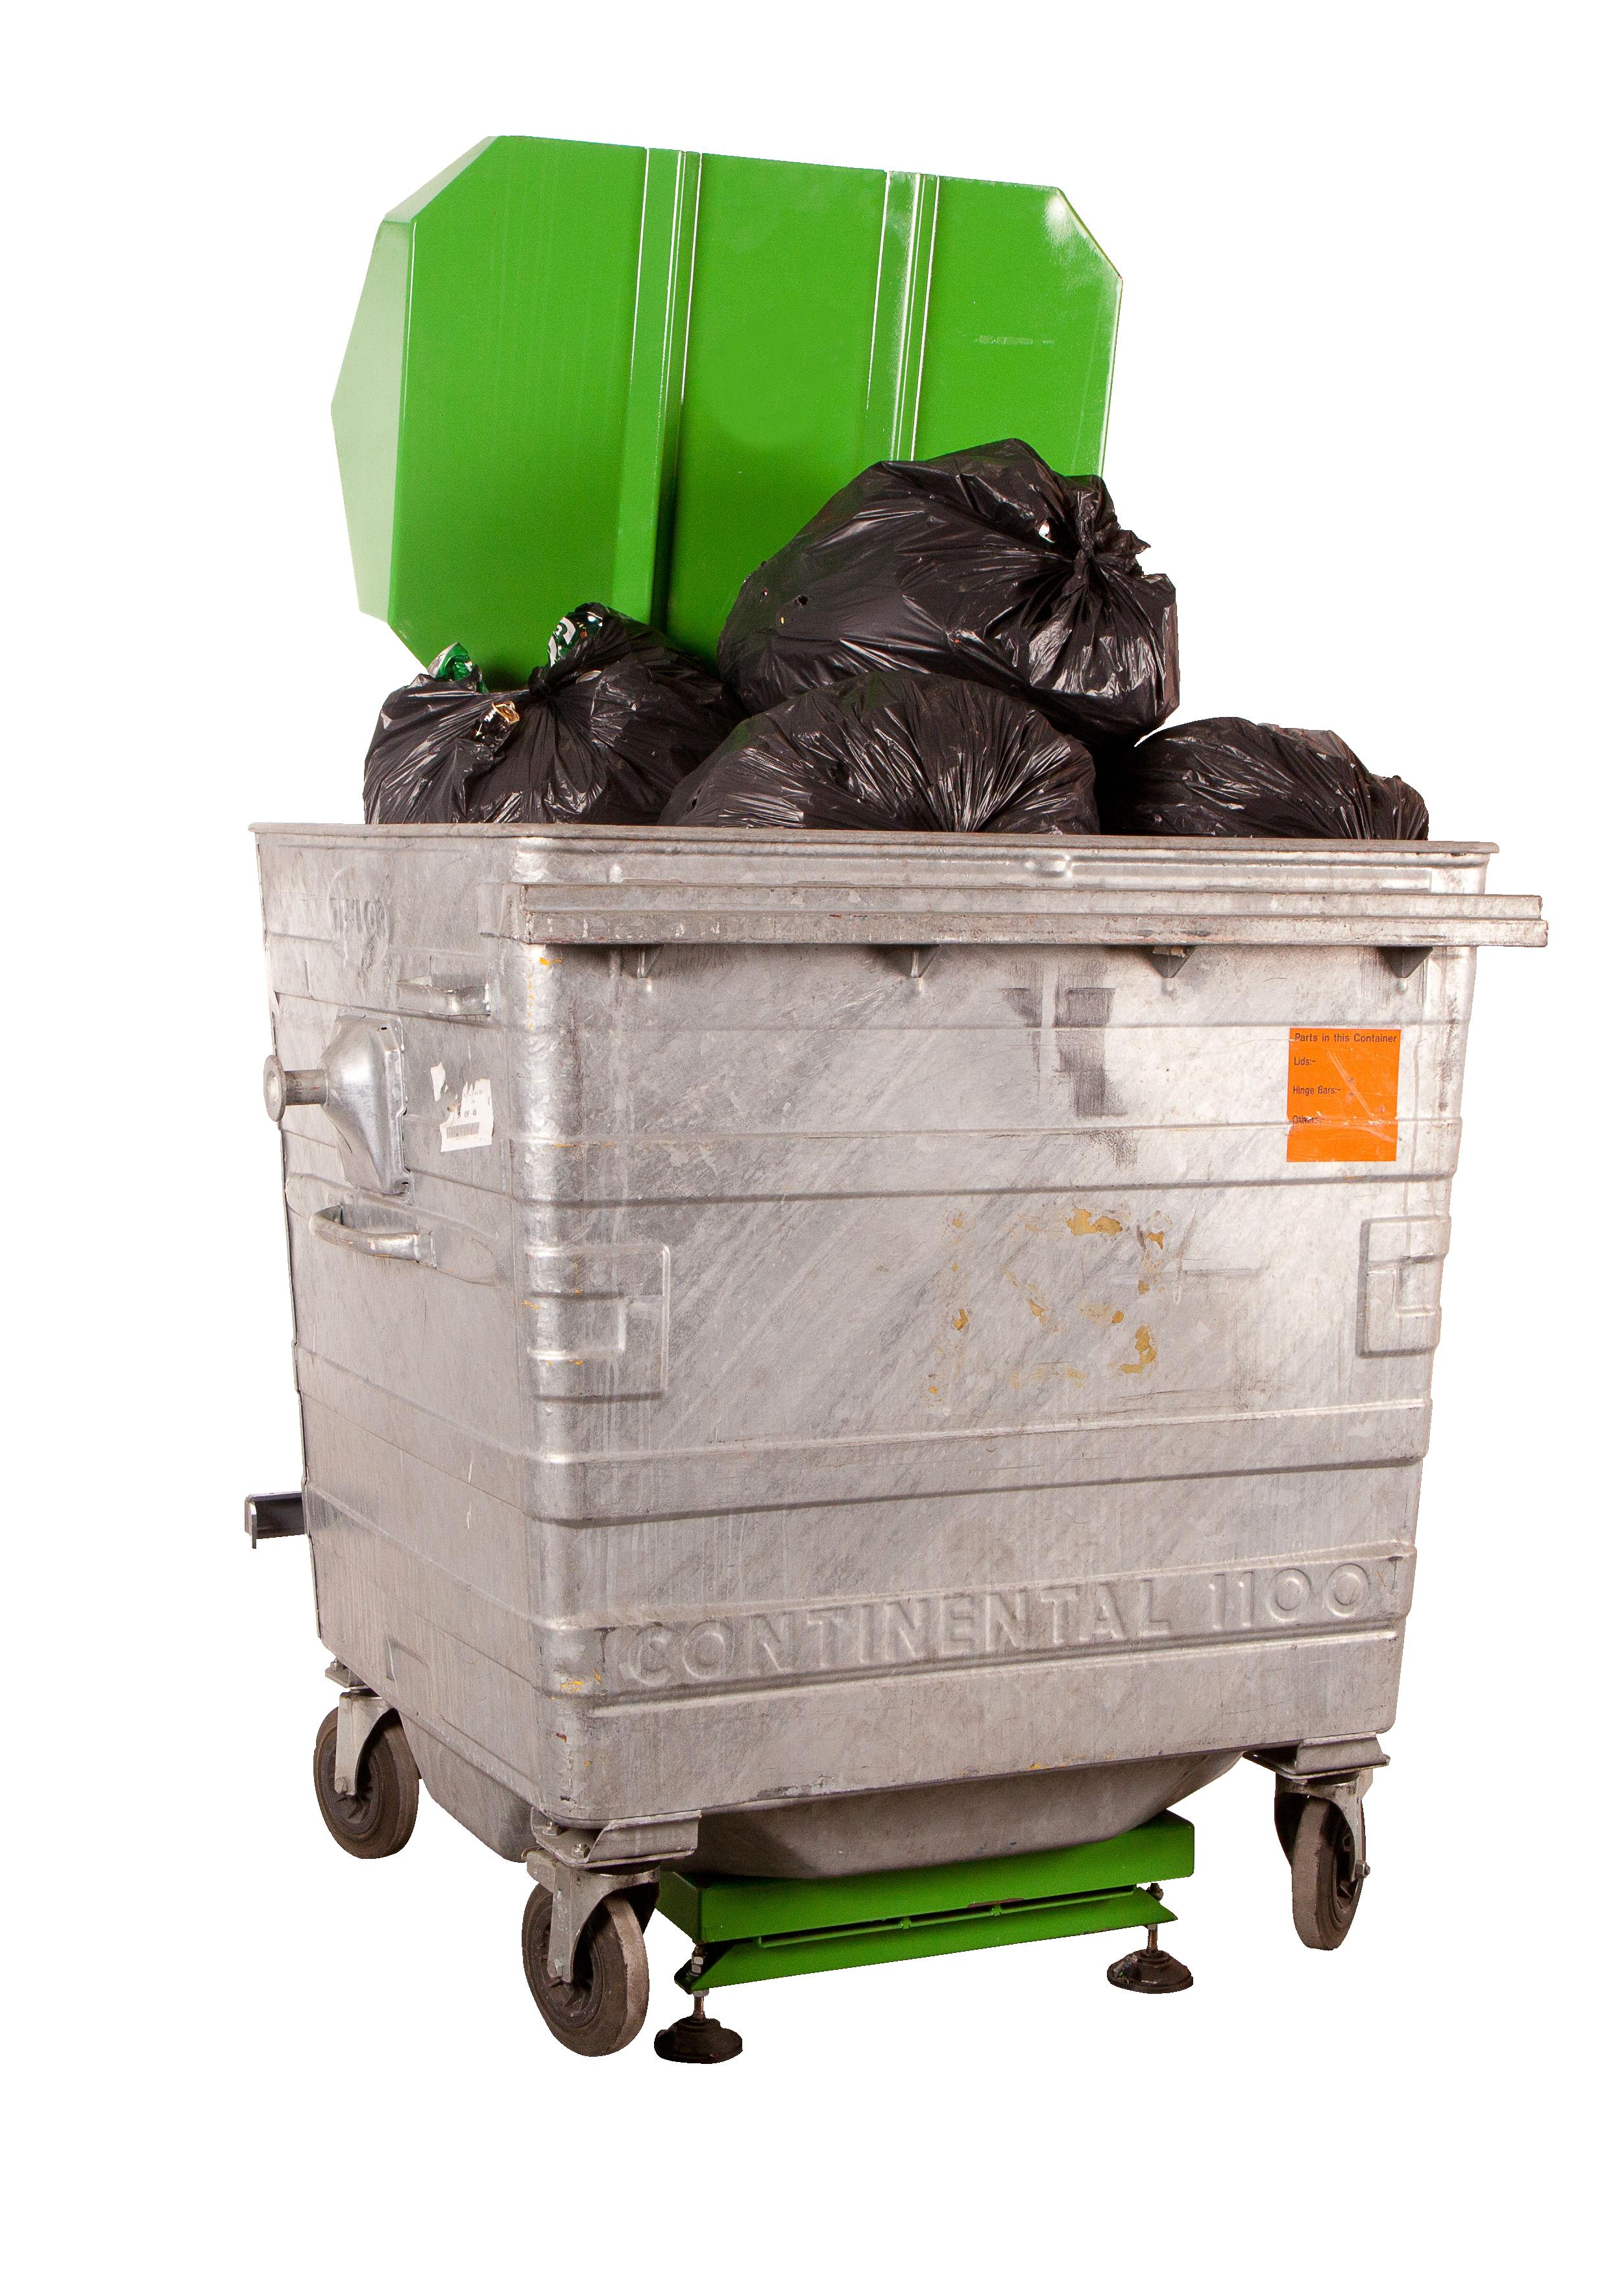 Prensa para contenedores de basura